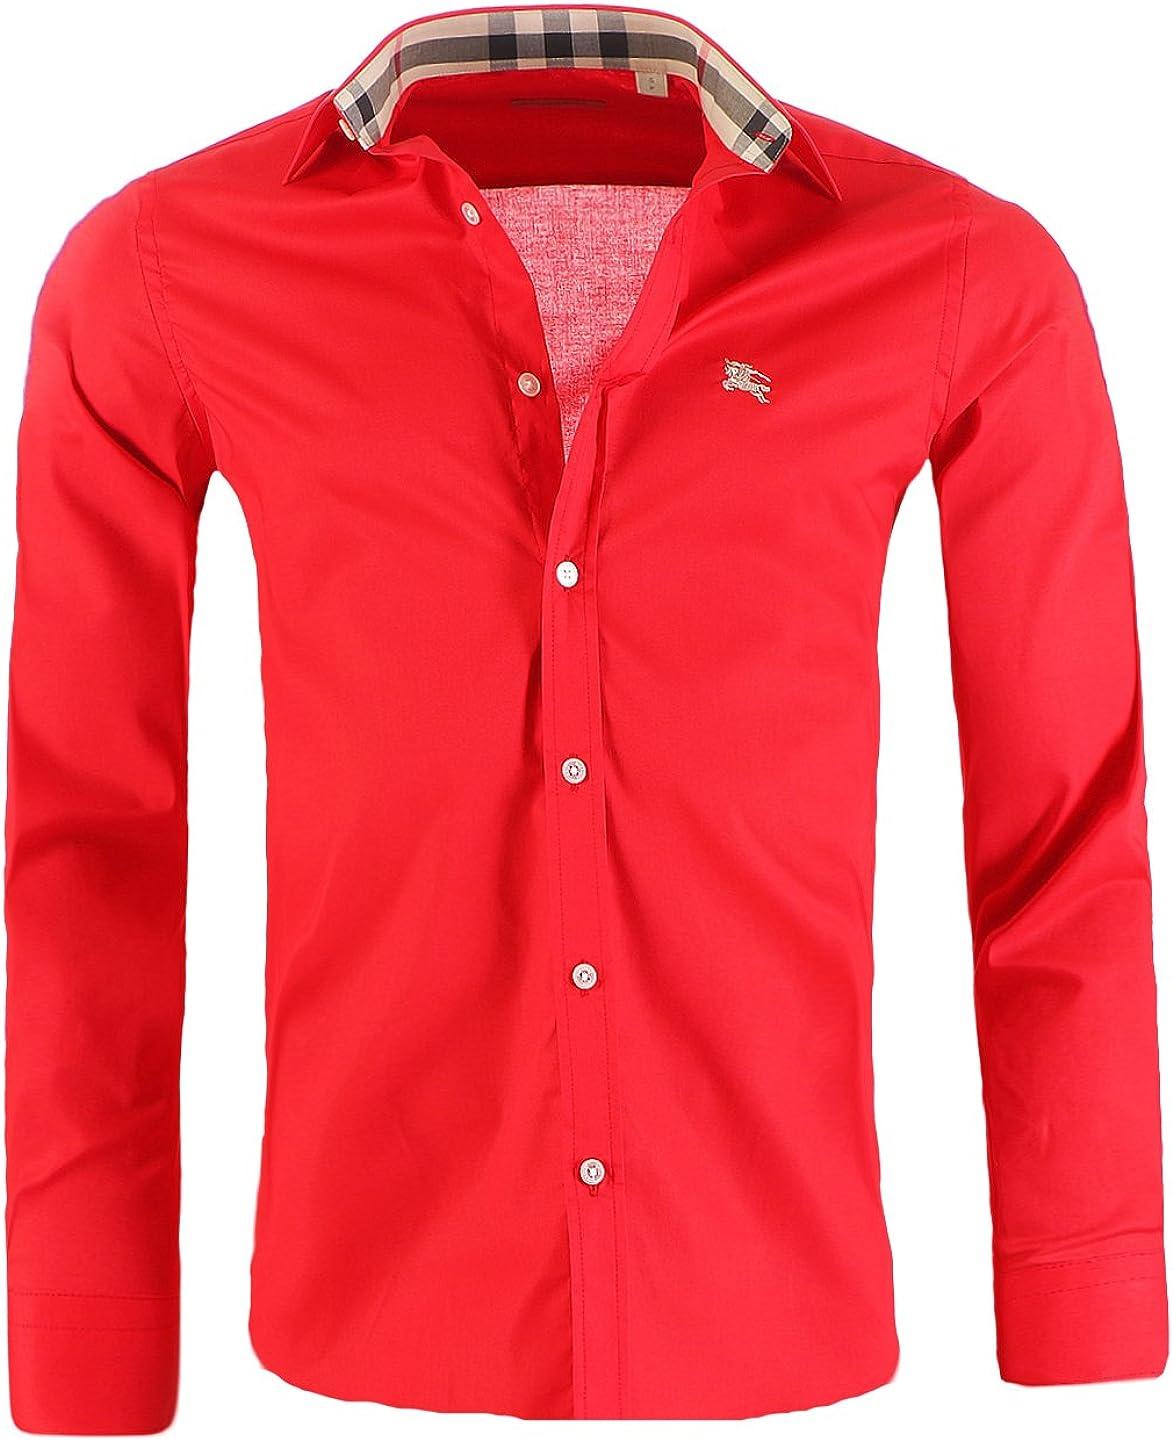 BURBERRY Camisa para hombre BRIT Slim Fit, Outletware